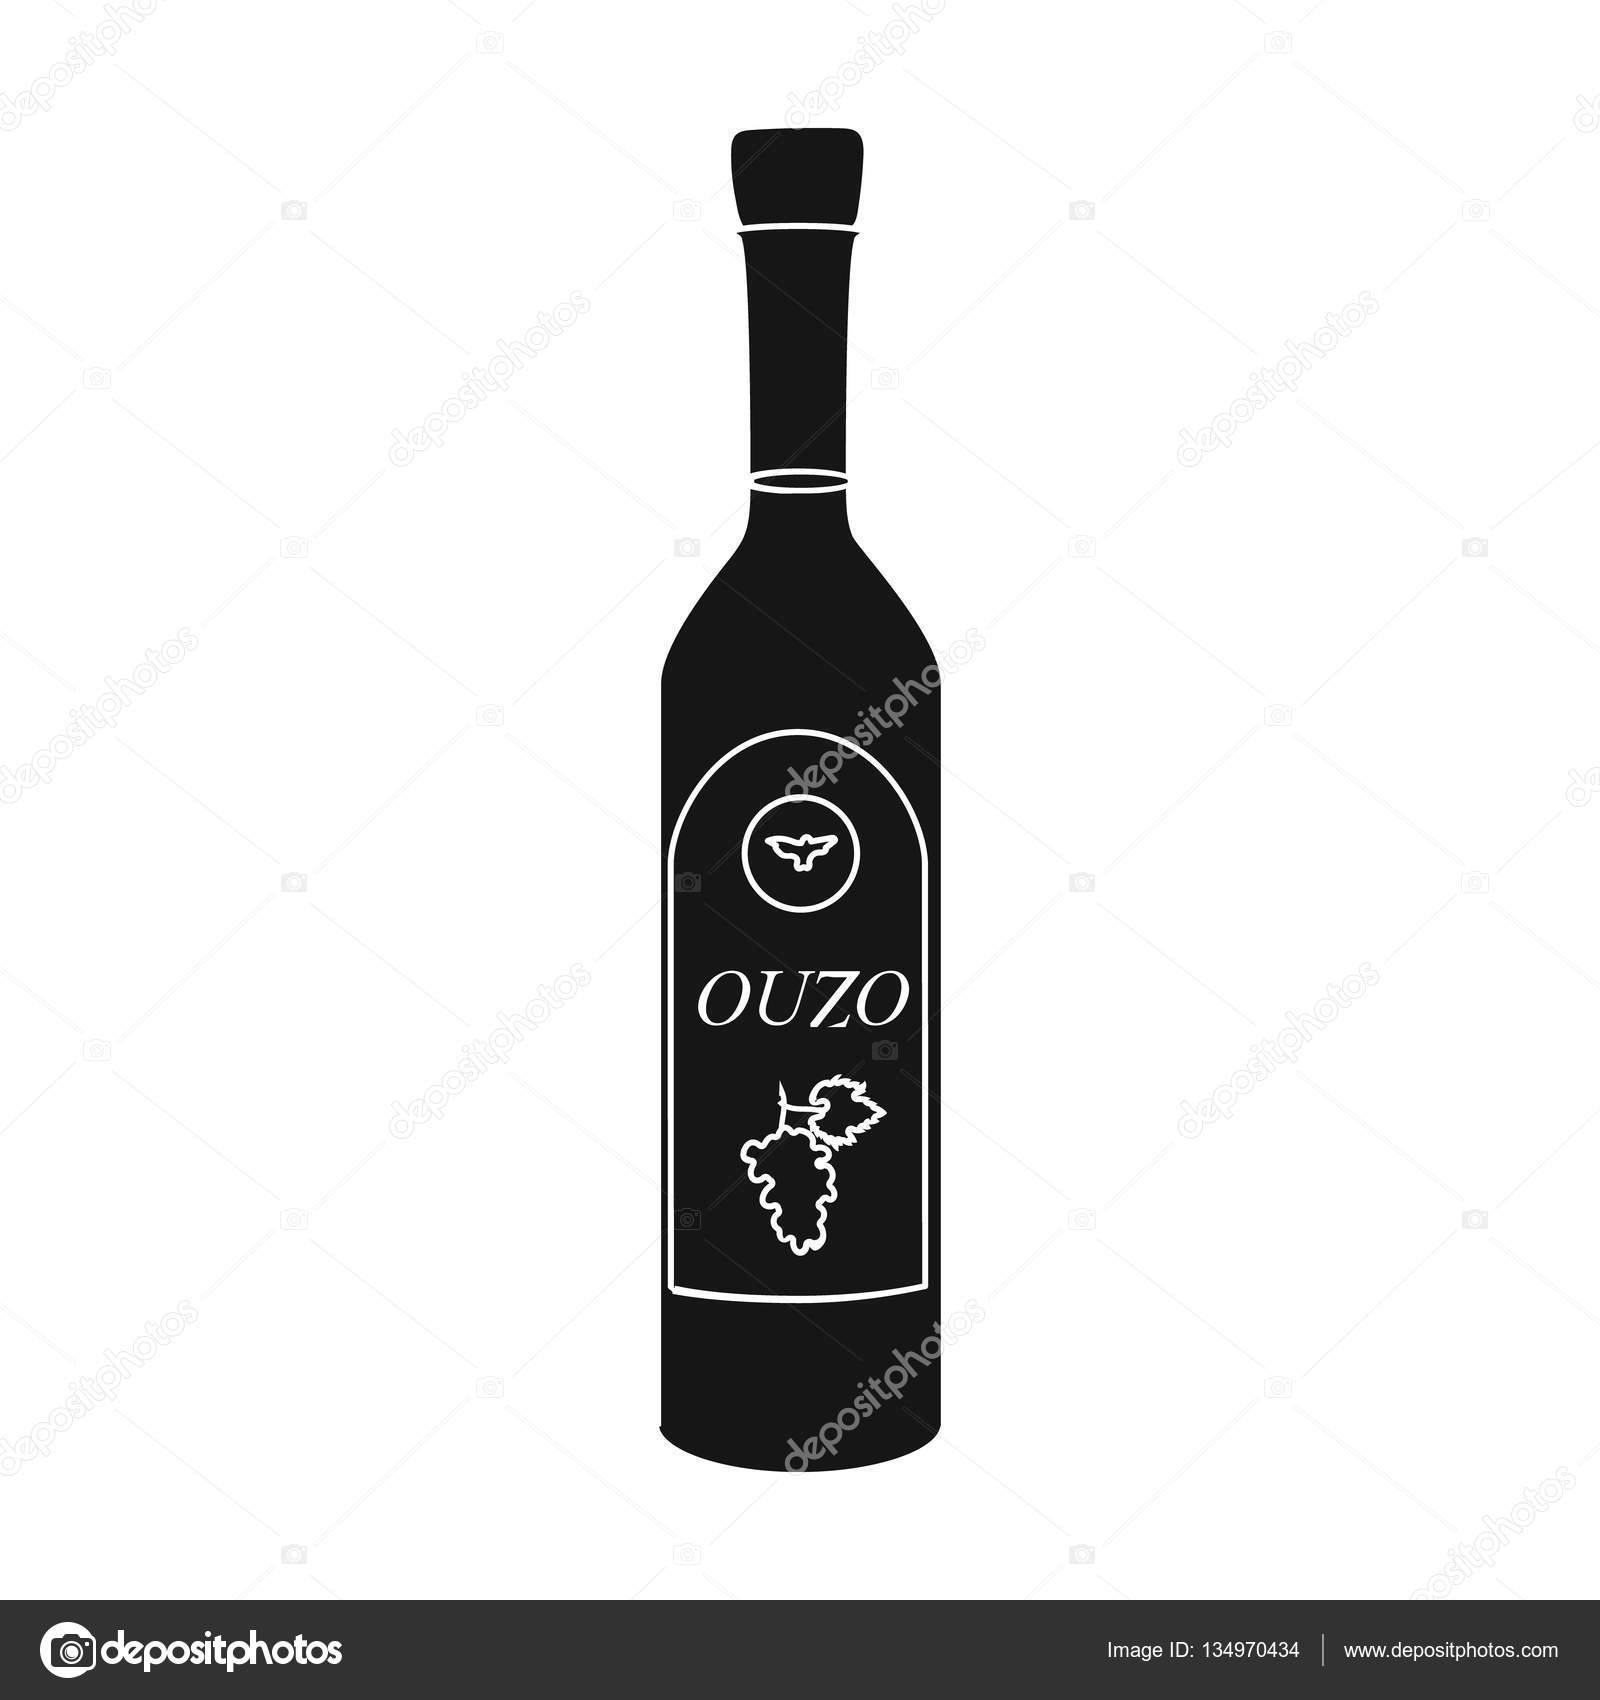 Bottle Of Ouzo Icon In Black Style Isolated On White